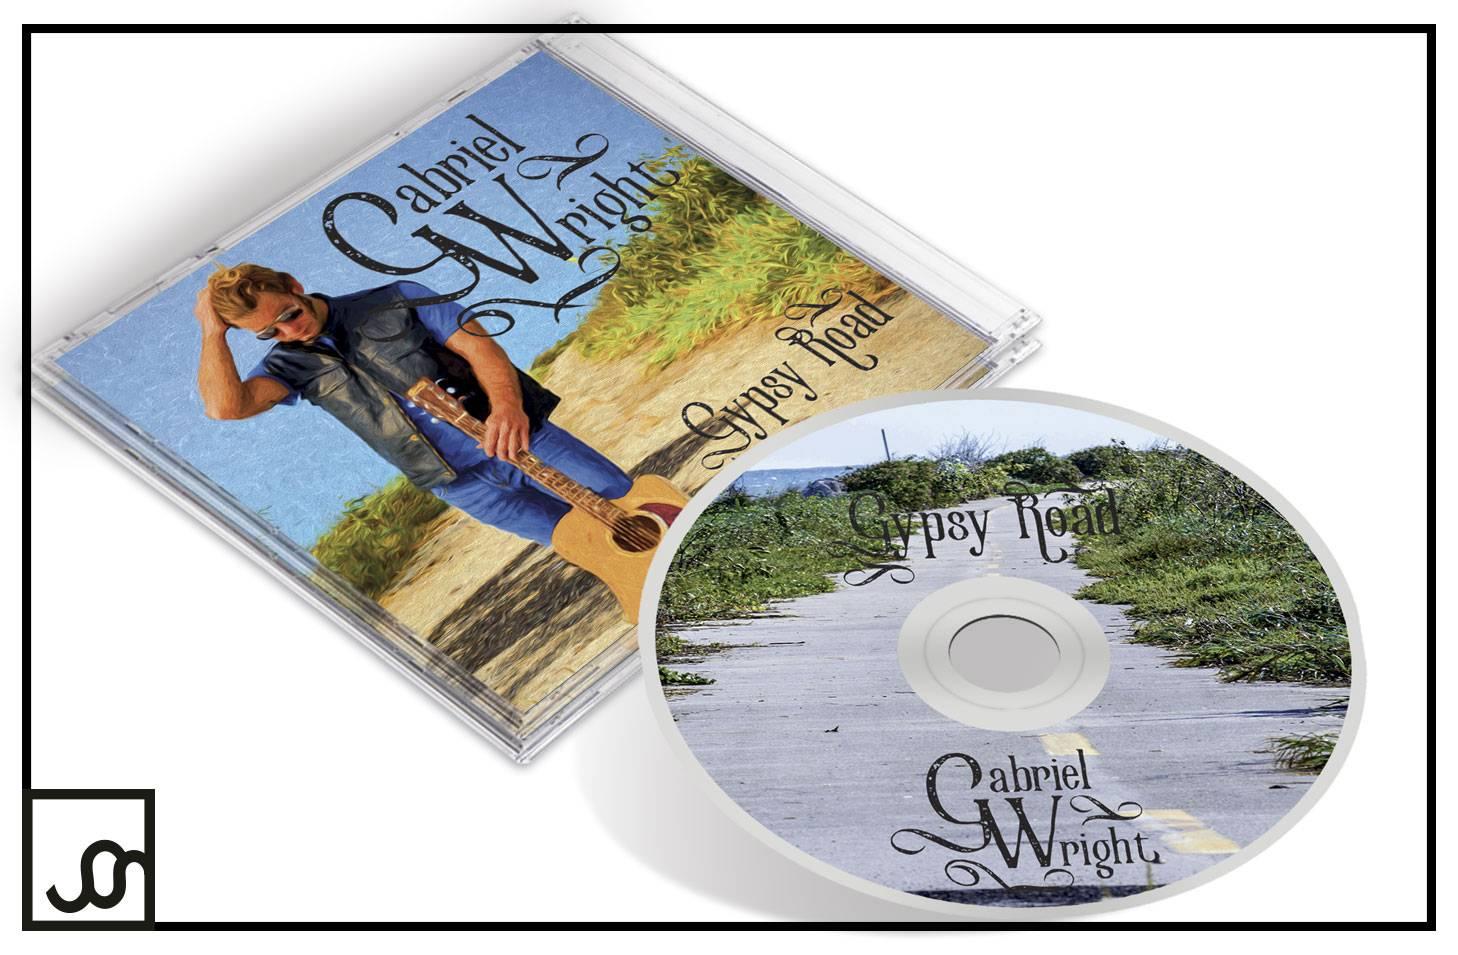 Gabriel Wright Artisti/Musician CD Layout